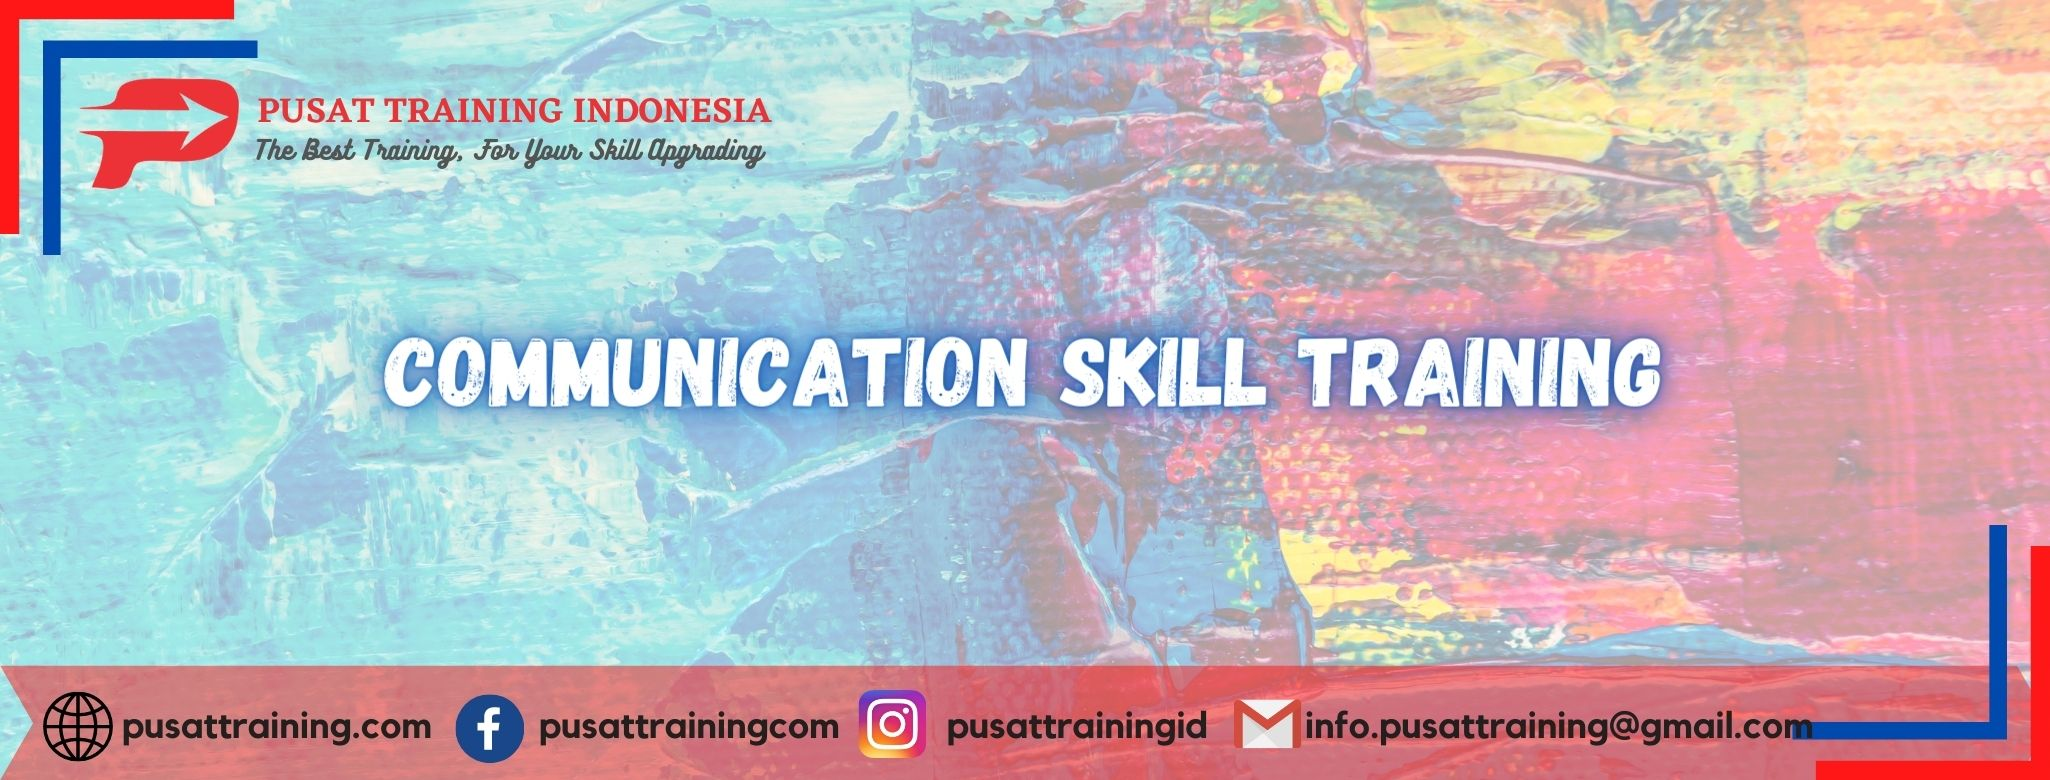 Communication-Skill-Training